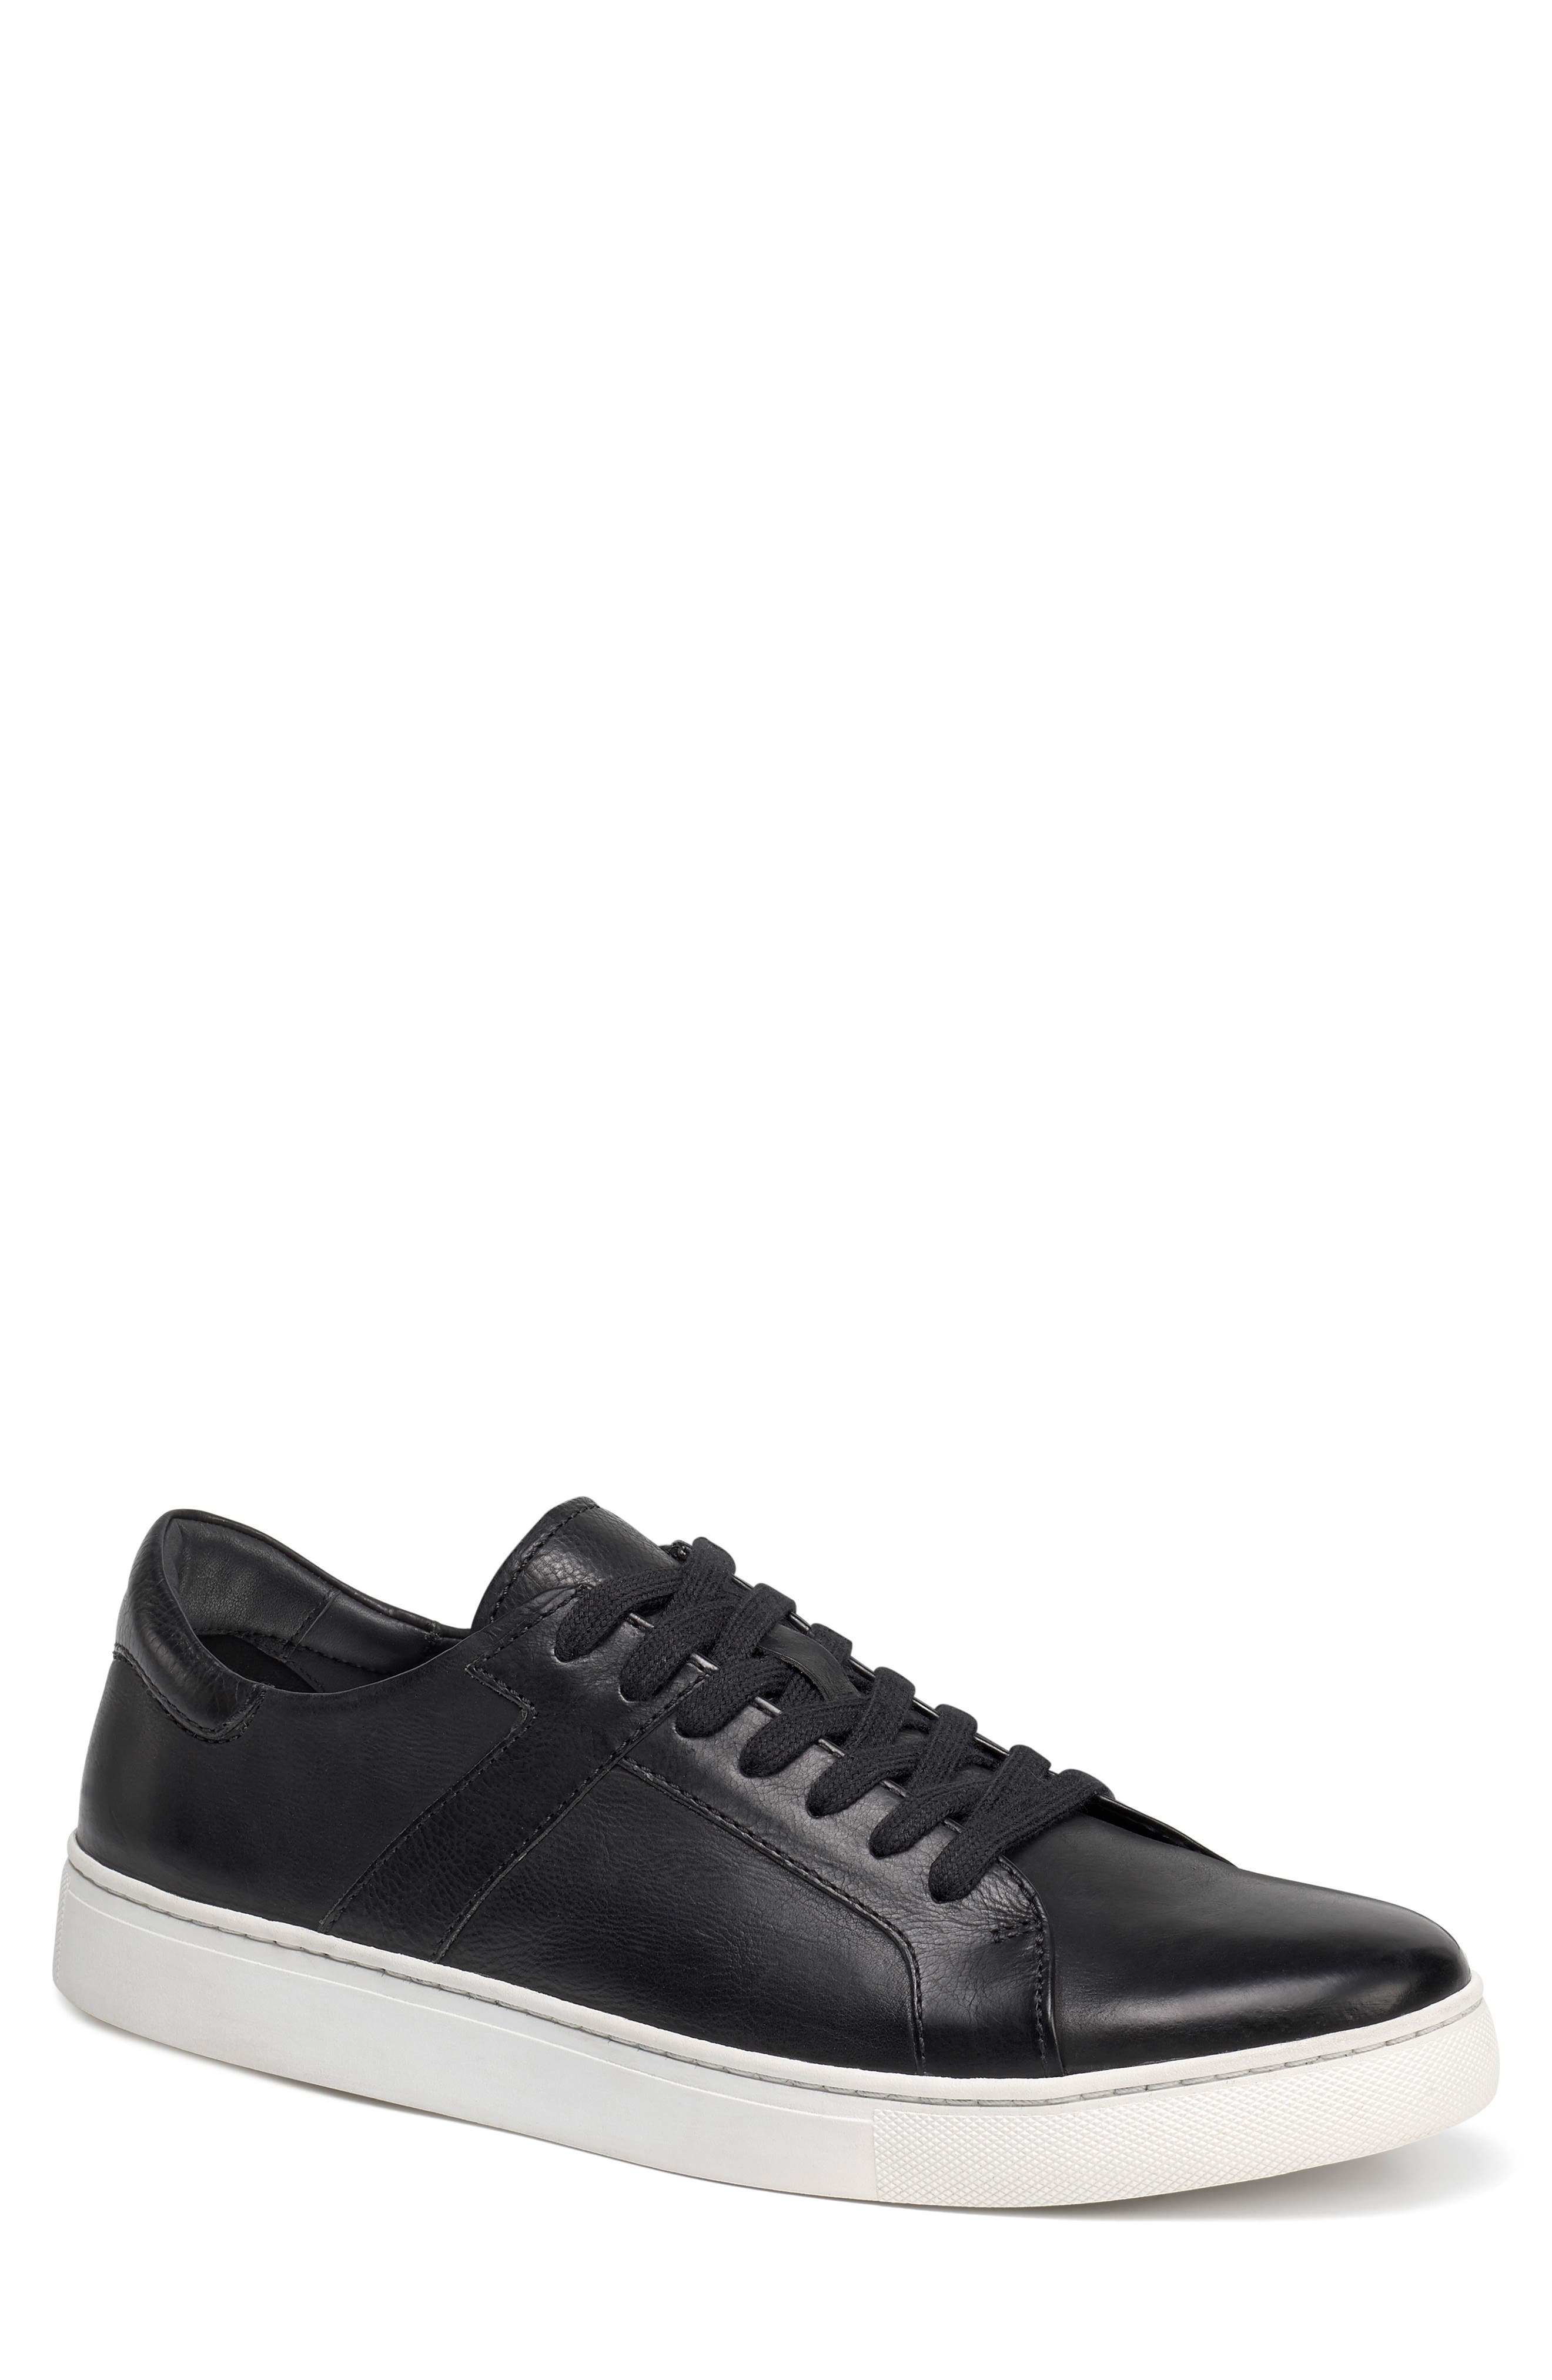 Trask Aaron Sneaker- Black